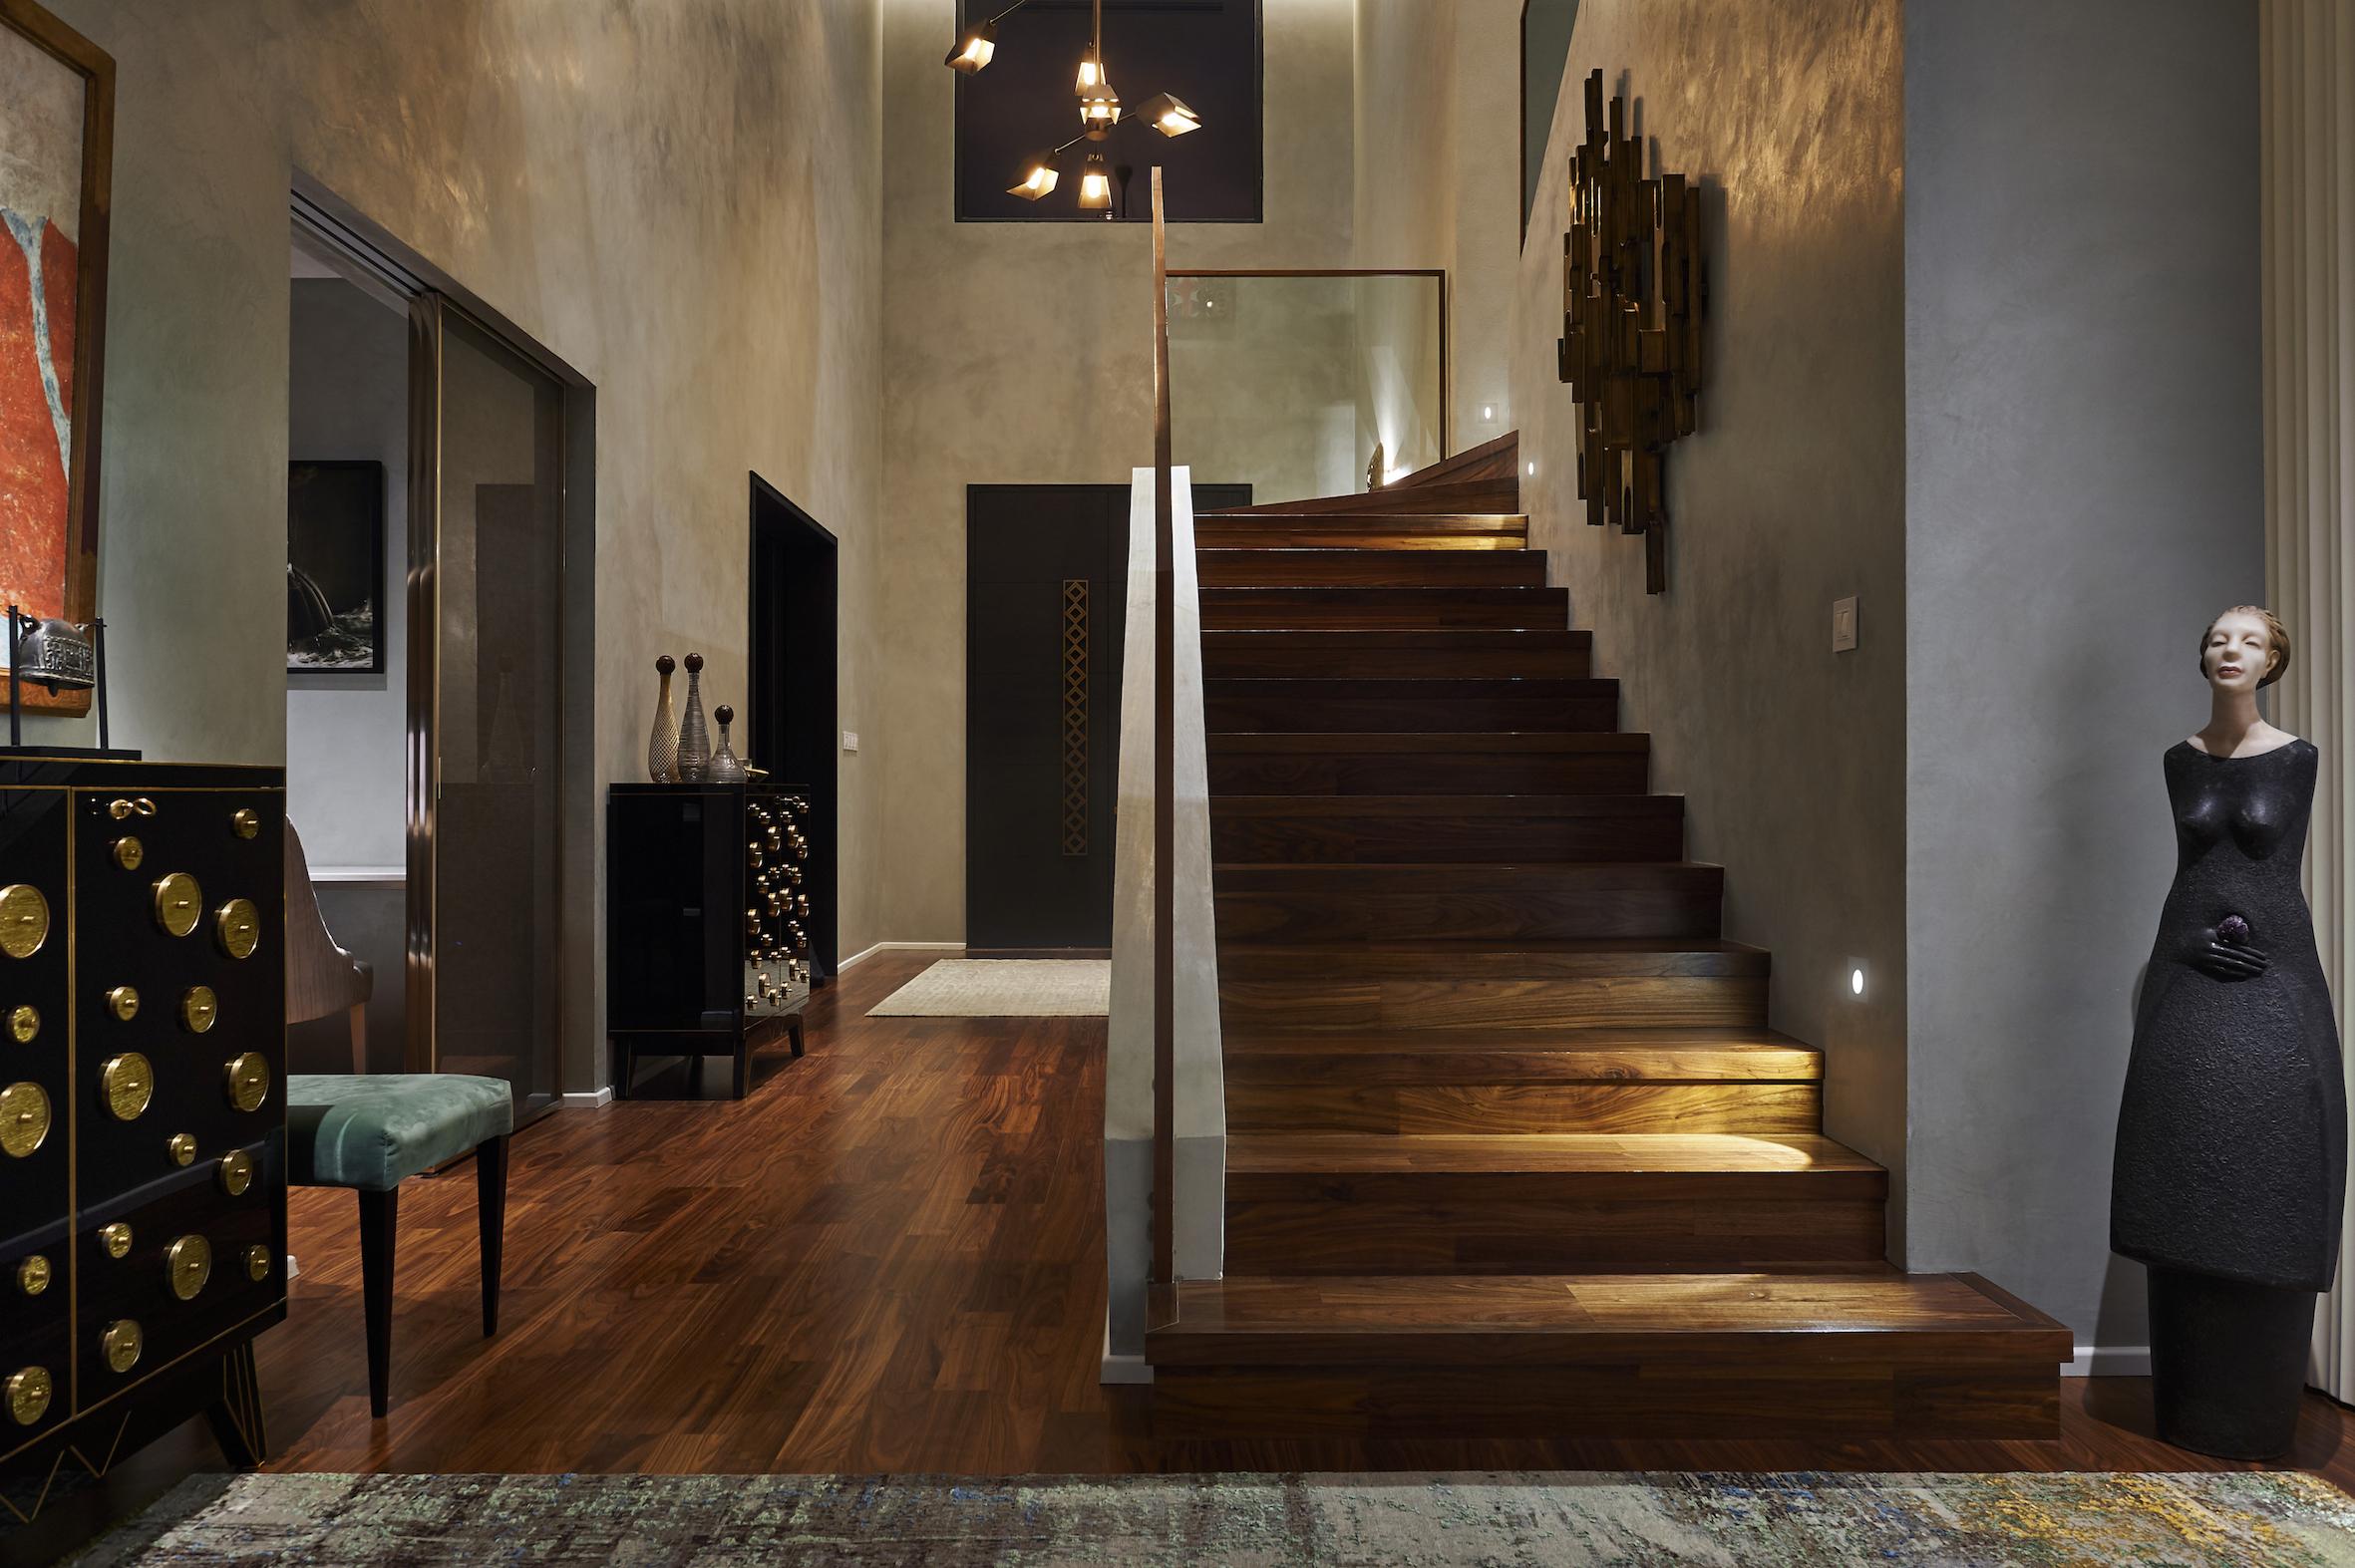 Nader-Gammas-Lighting-Design-Palm-Stairs.JPG